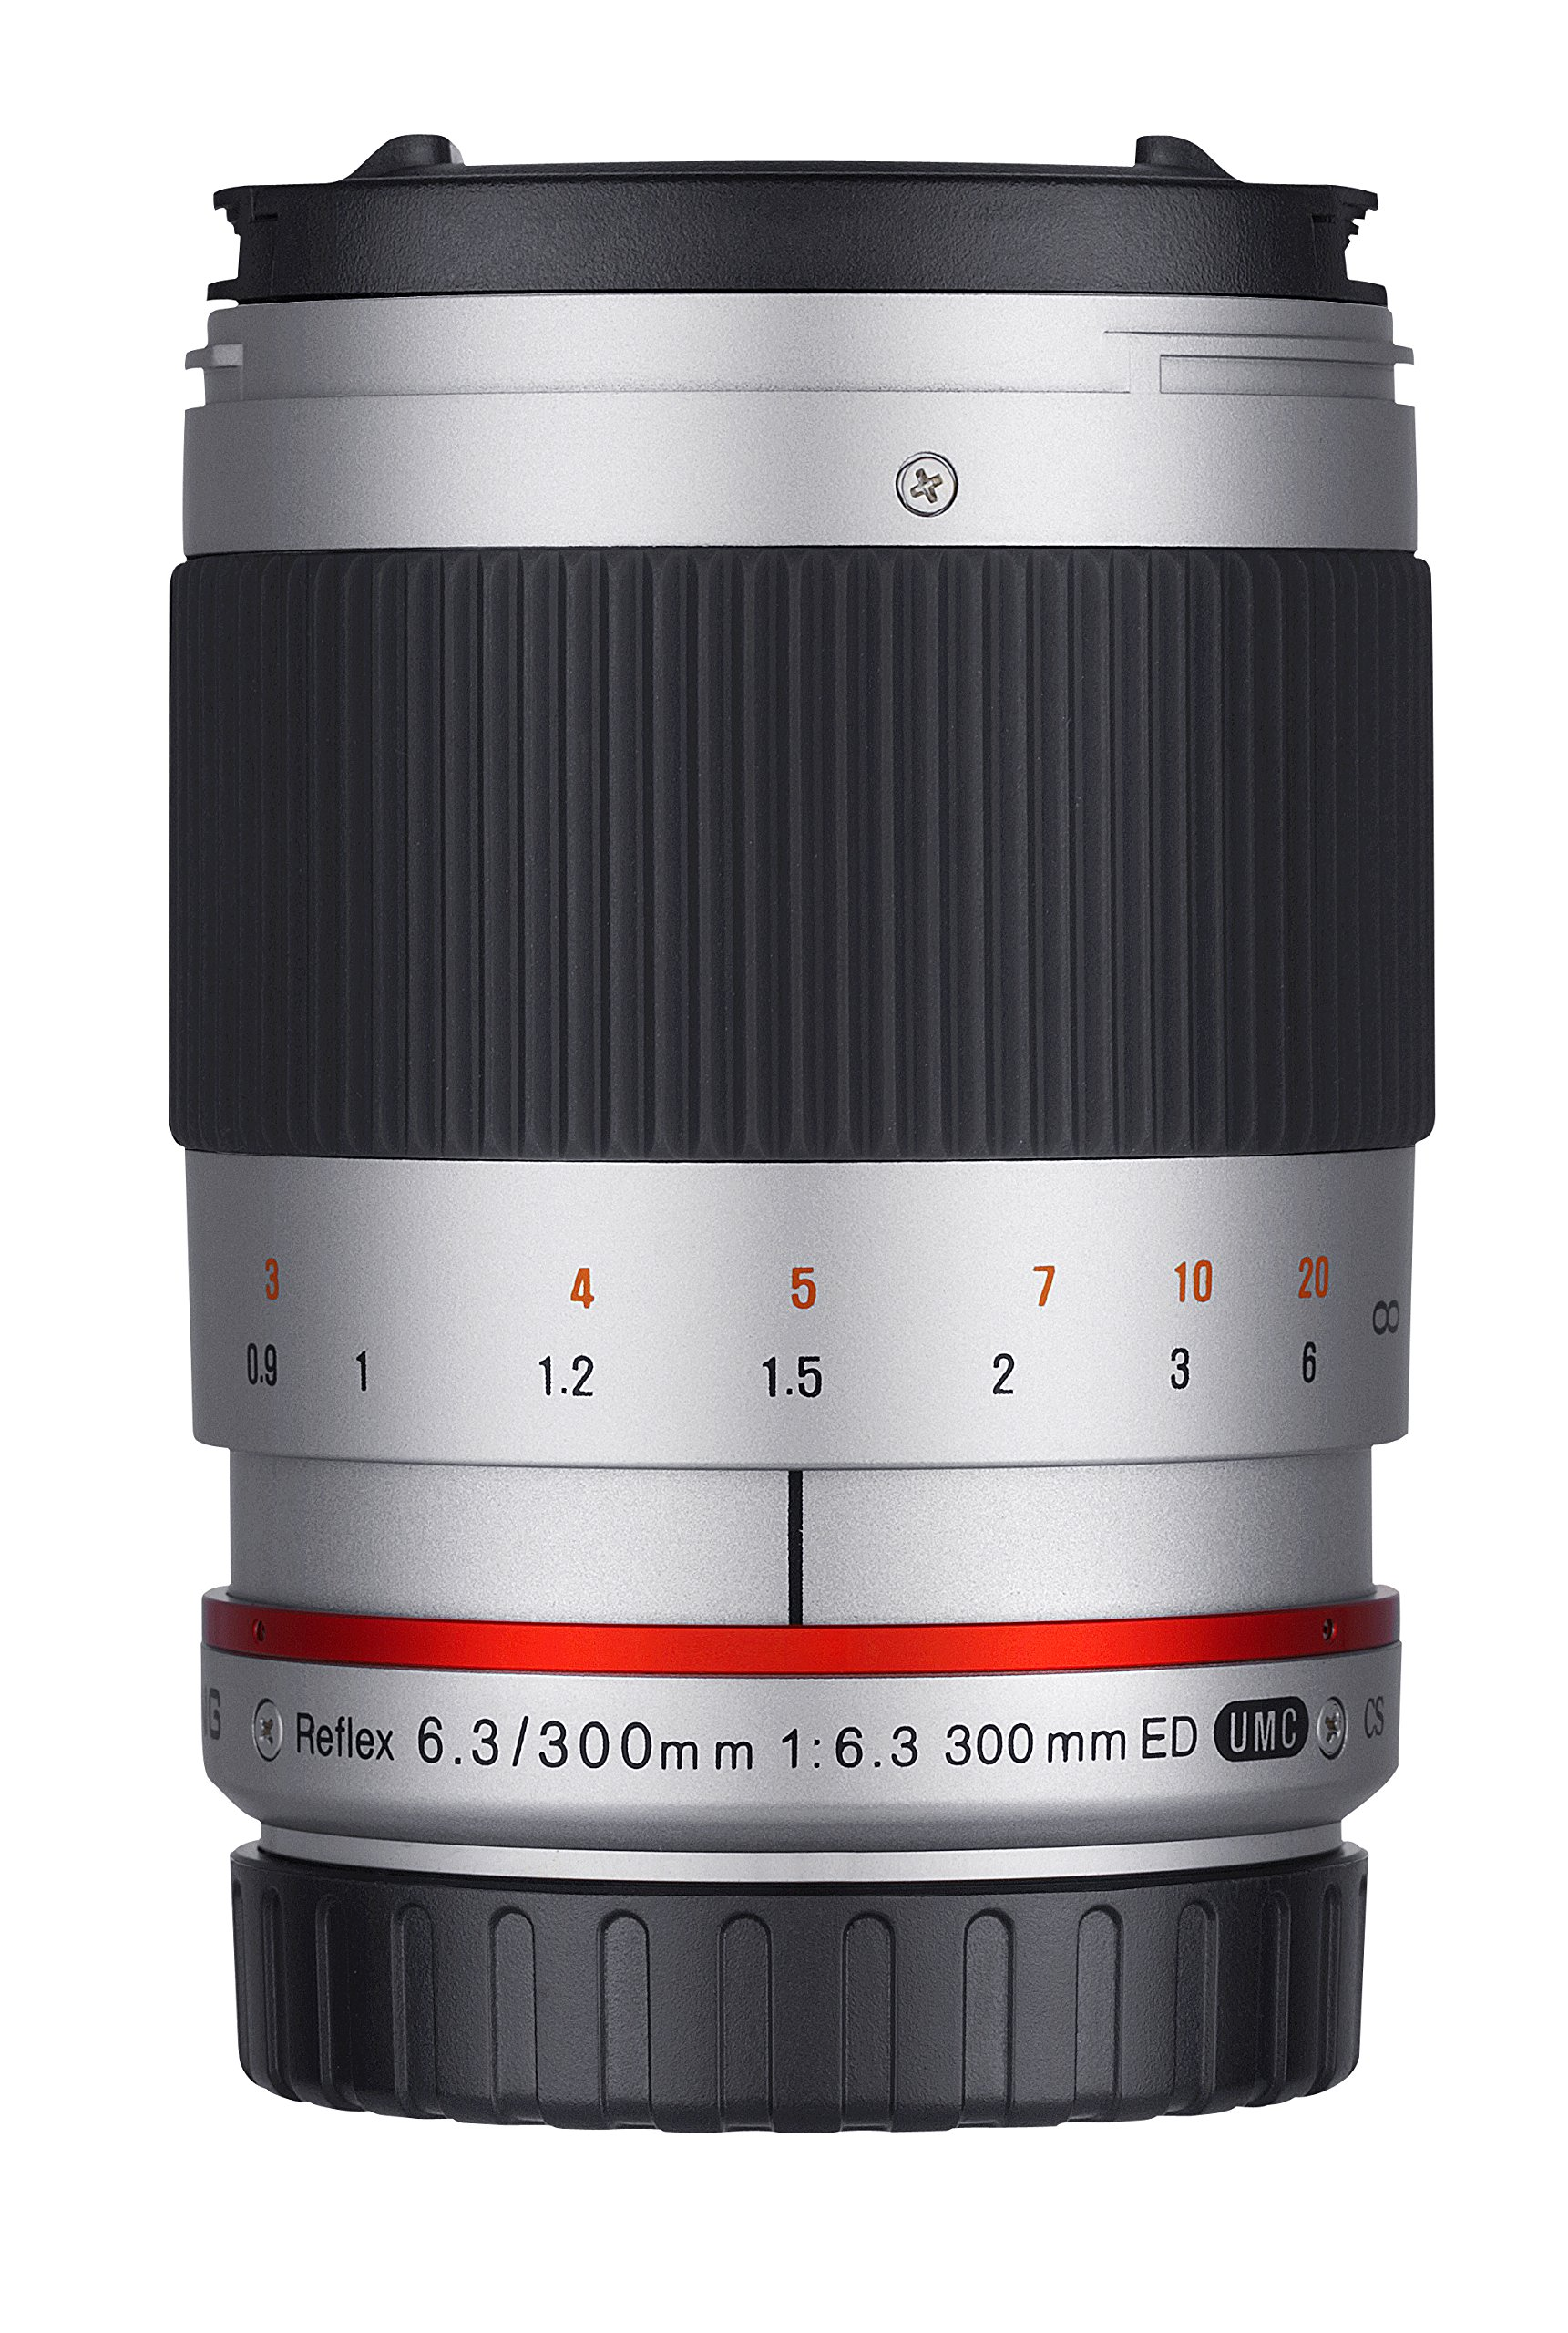 Samyang Obiettivo 300mm F 6,3 per Fuji X, Silver